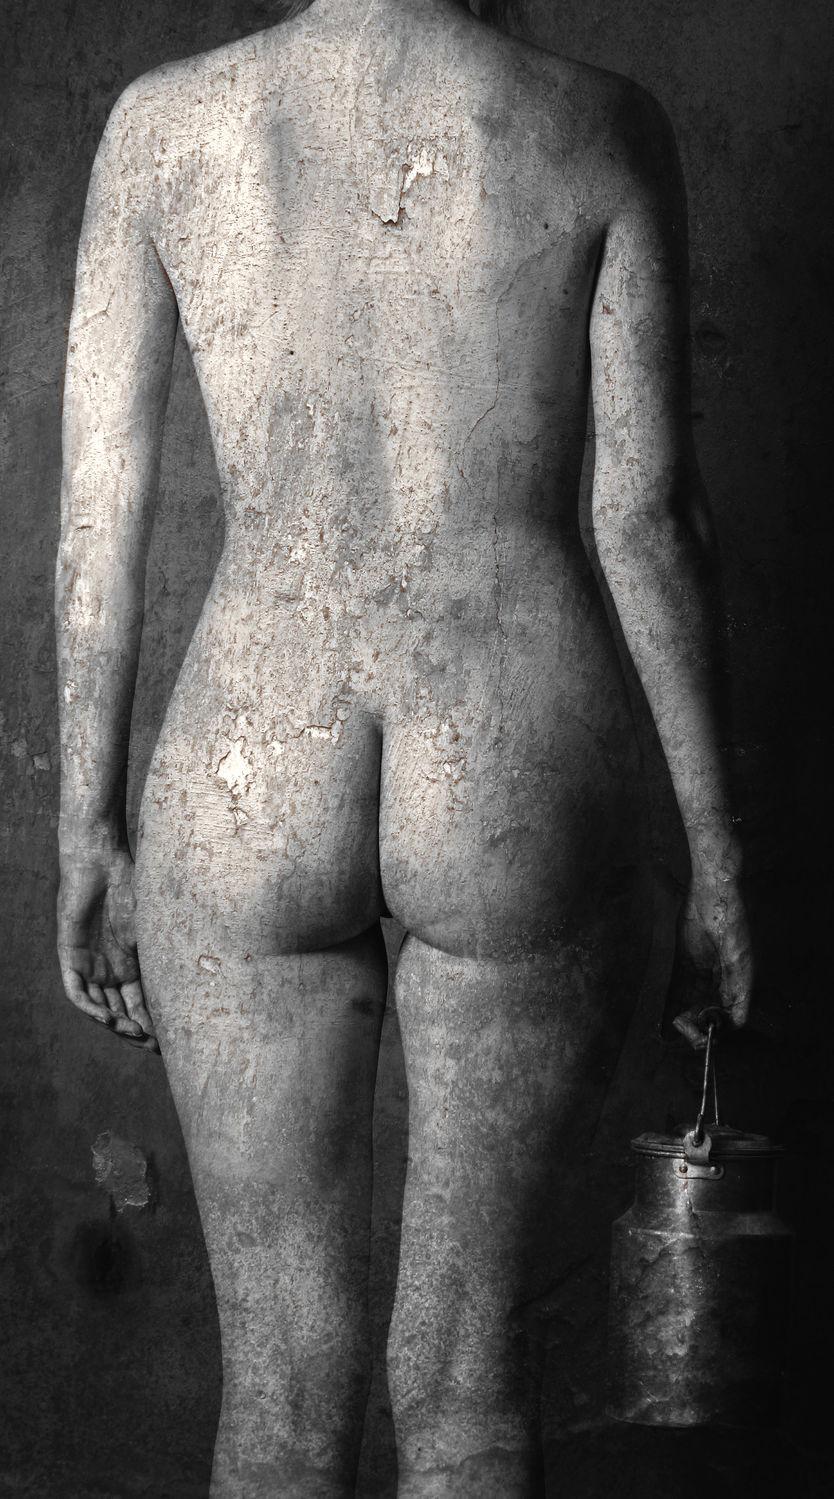 Bild mit Fotokunst Art FF77, Erotik, Portrait, Studio, Frau, Aktmodel, Aktfoto, Aktfotografie, erotisch, Frauen, nackt, Sexy, Brust, Erotic, Akt & Erotik, girl